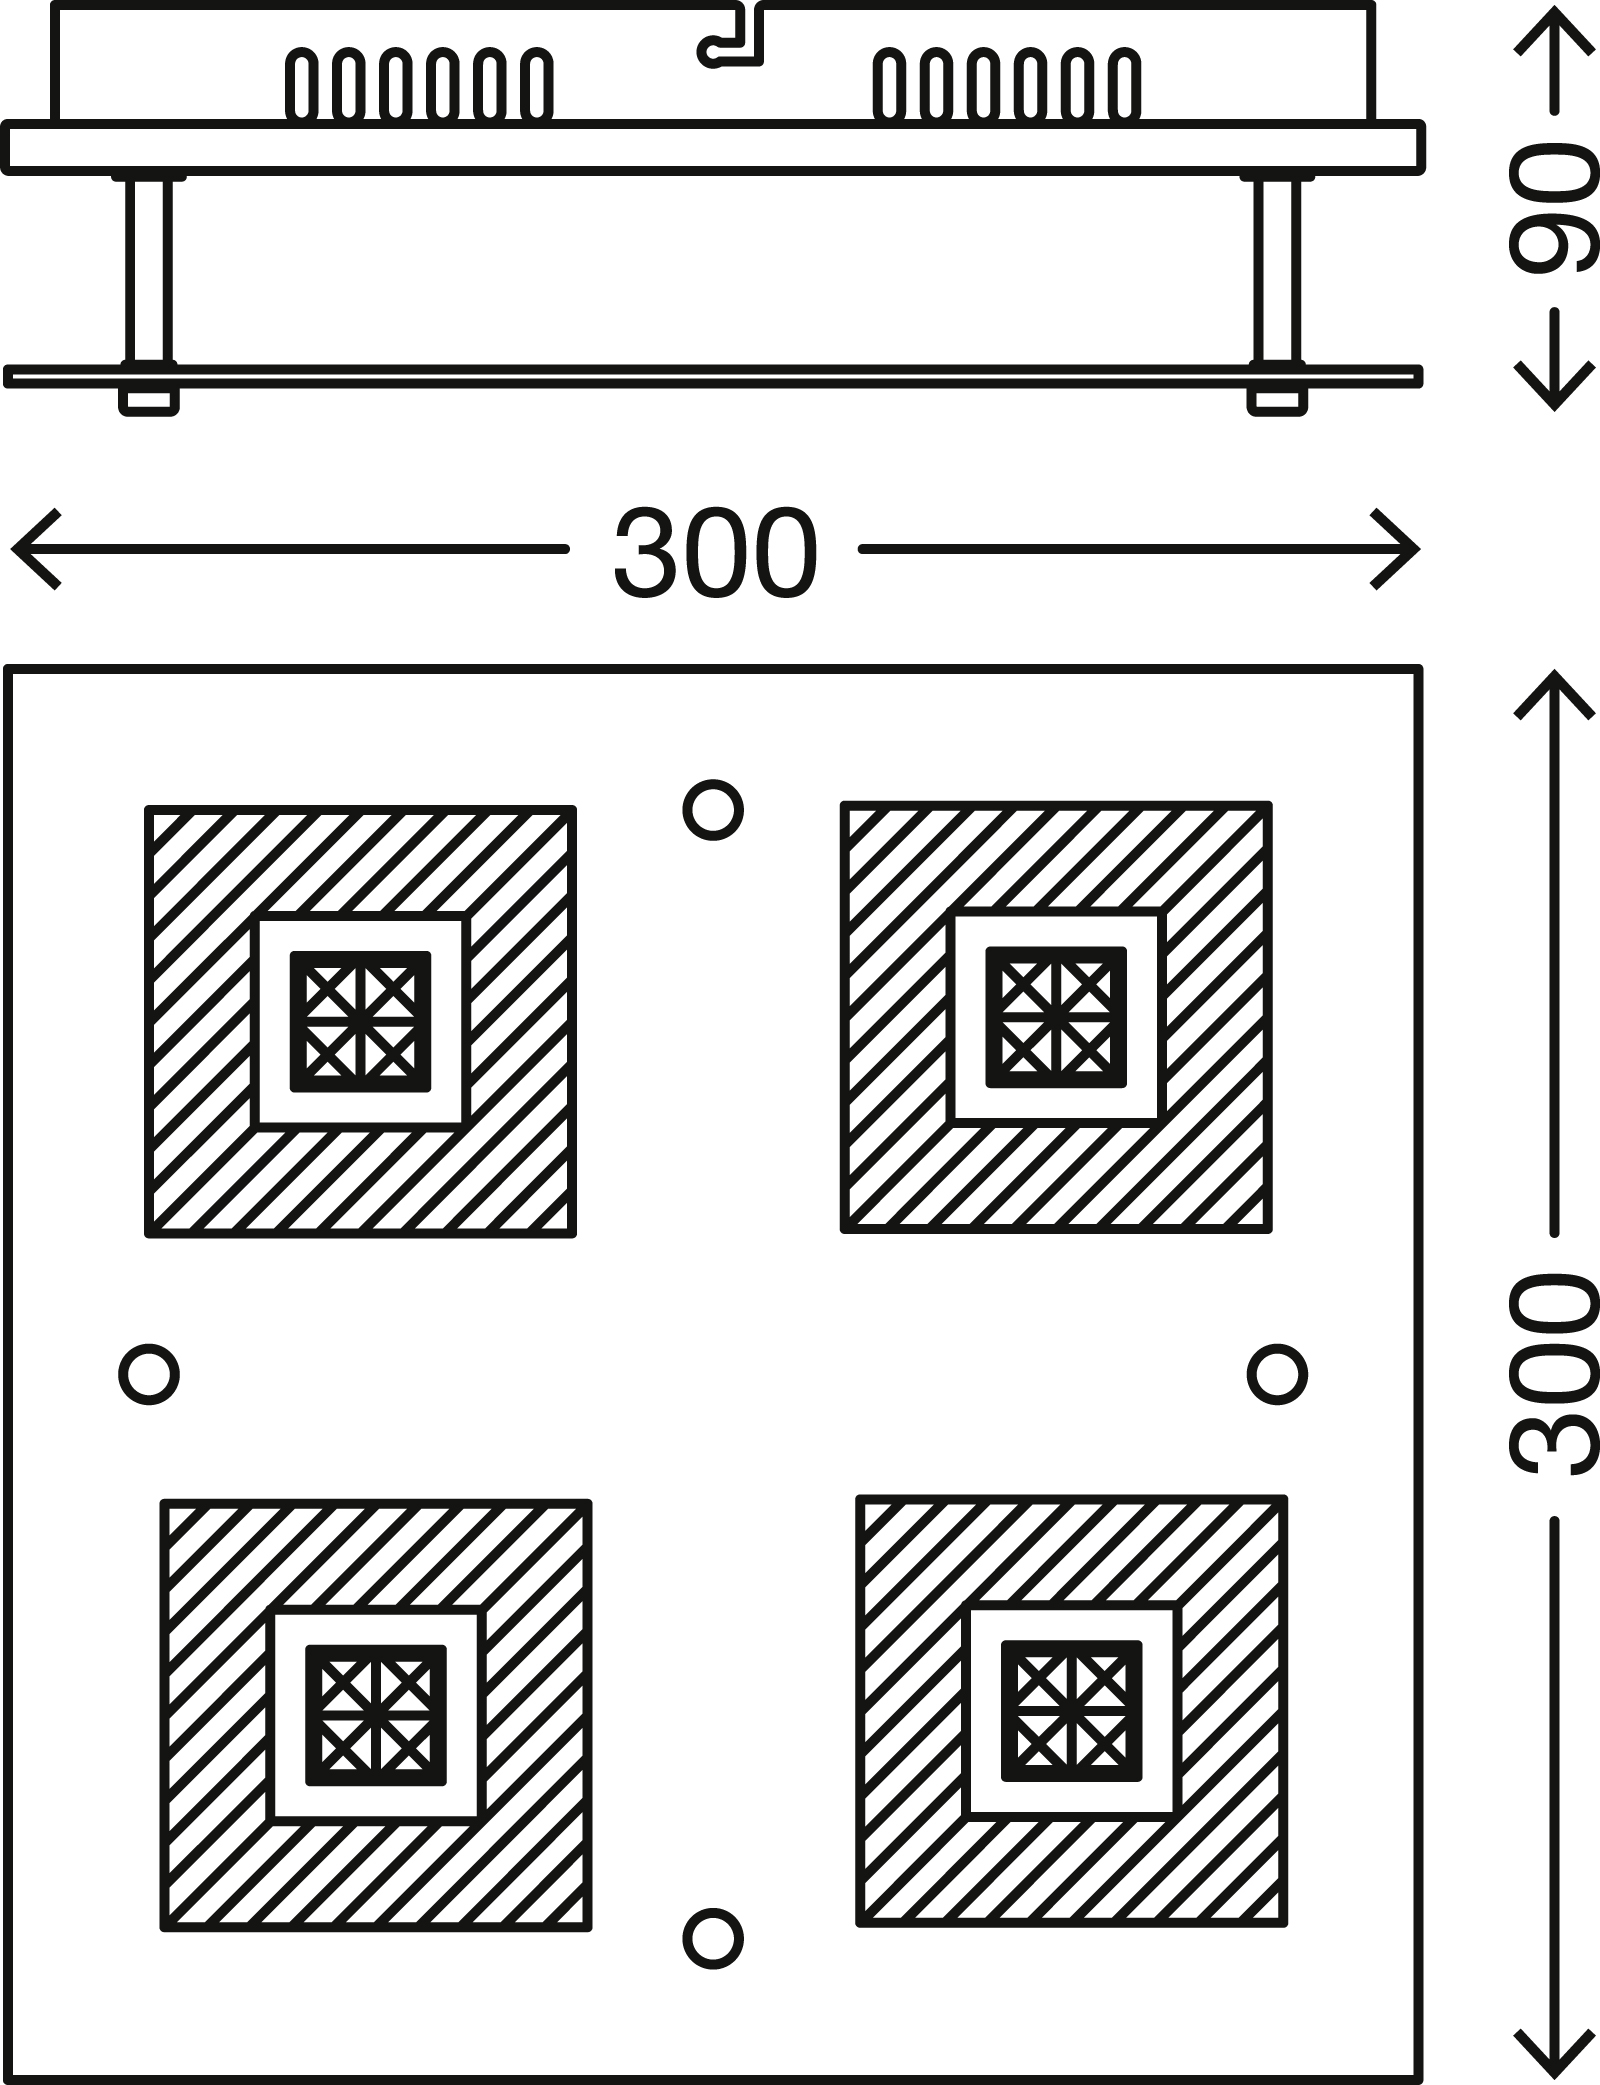 LED Deckenleuchte, 30 cm, 12 W, Chrom